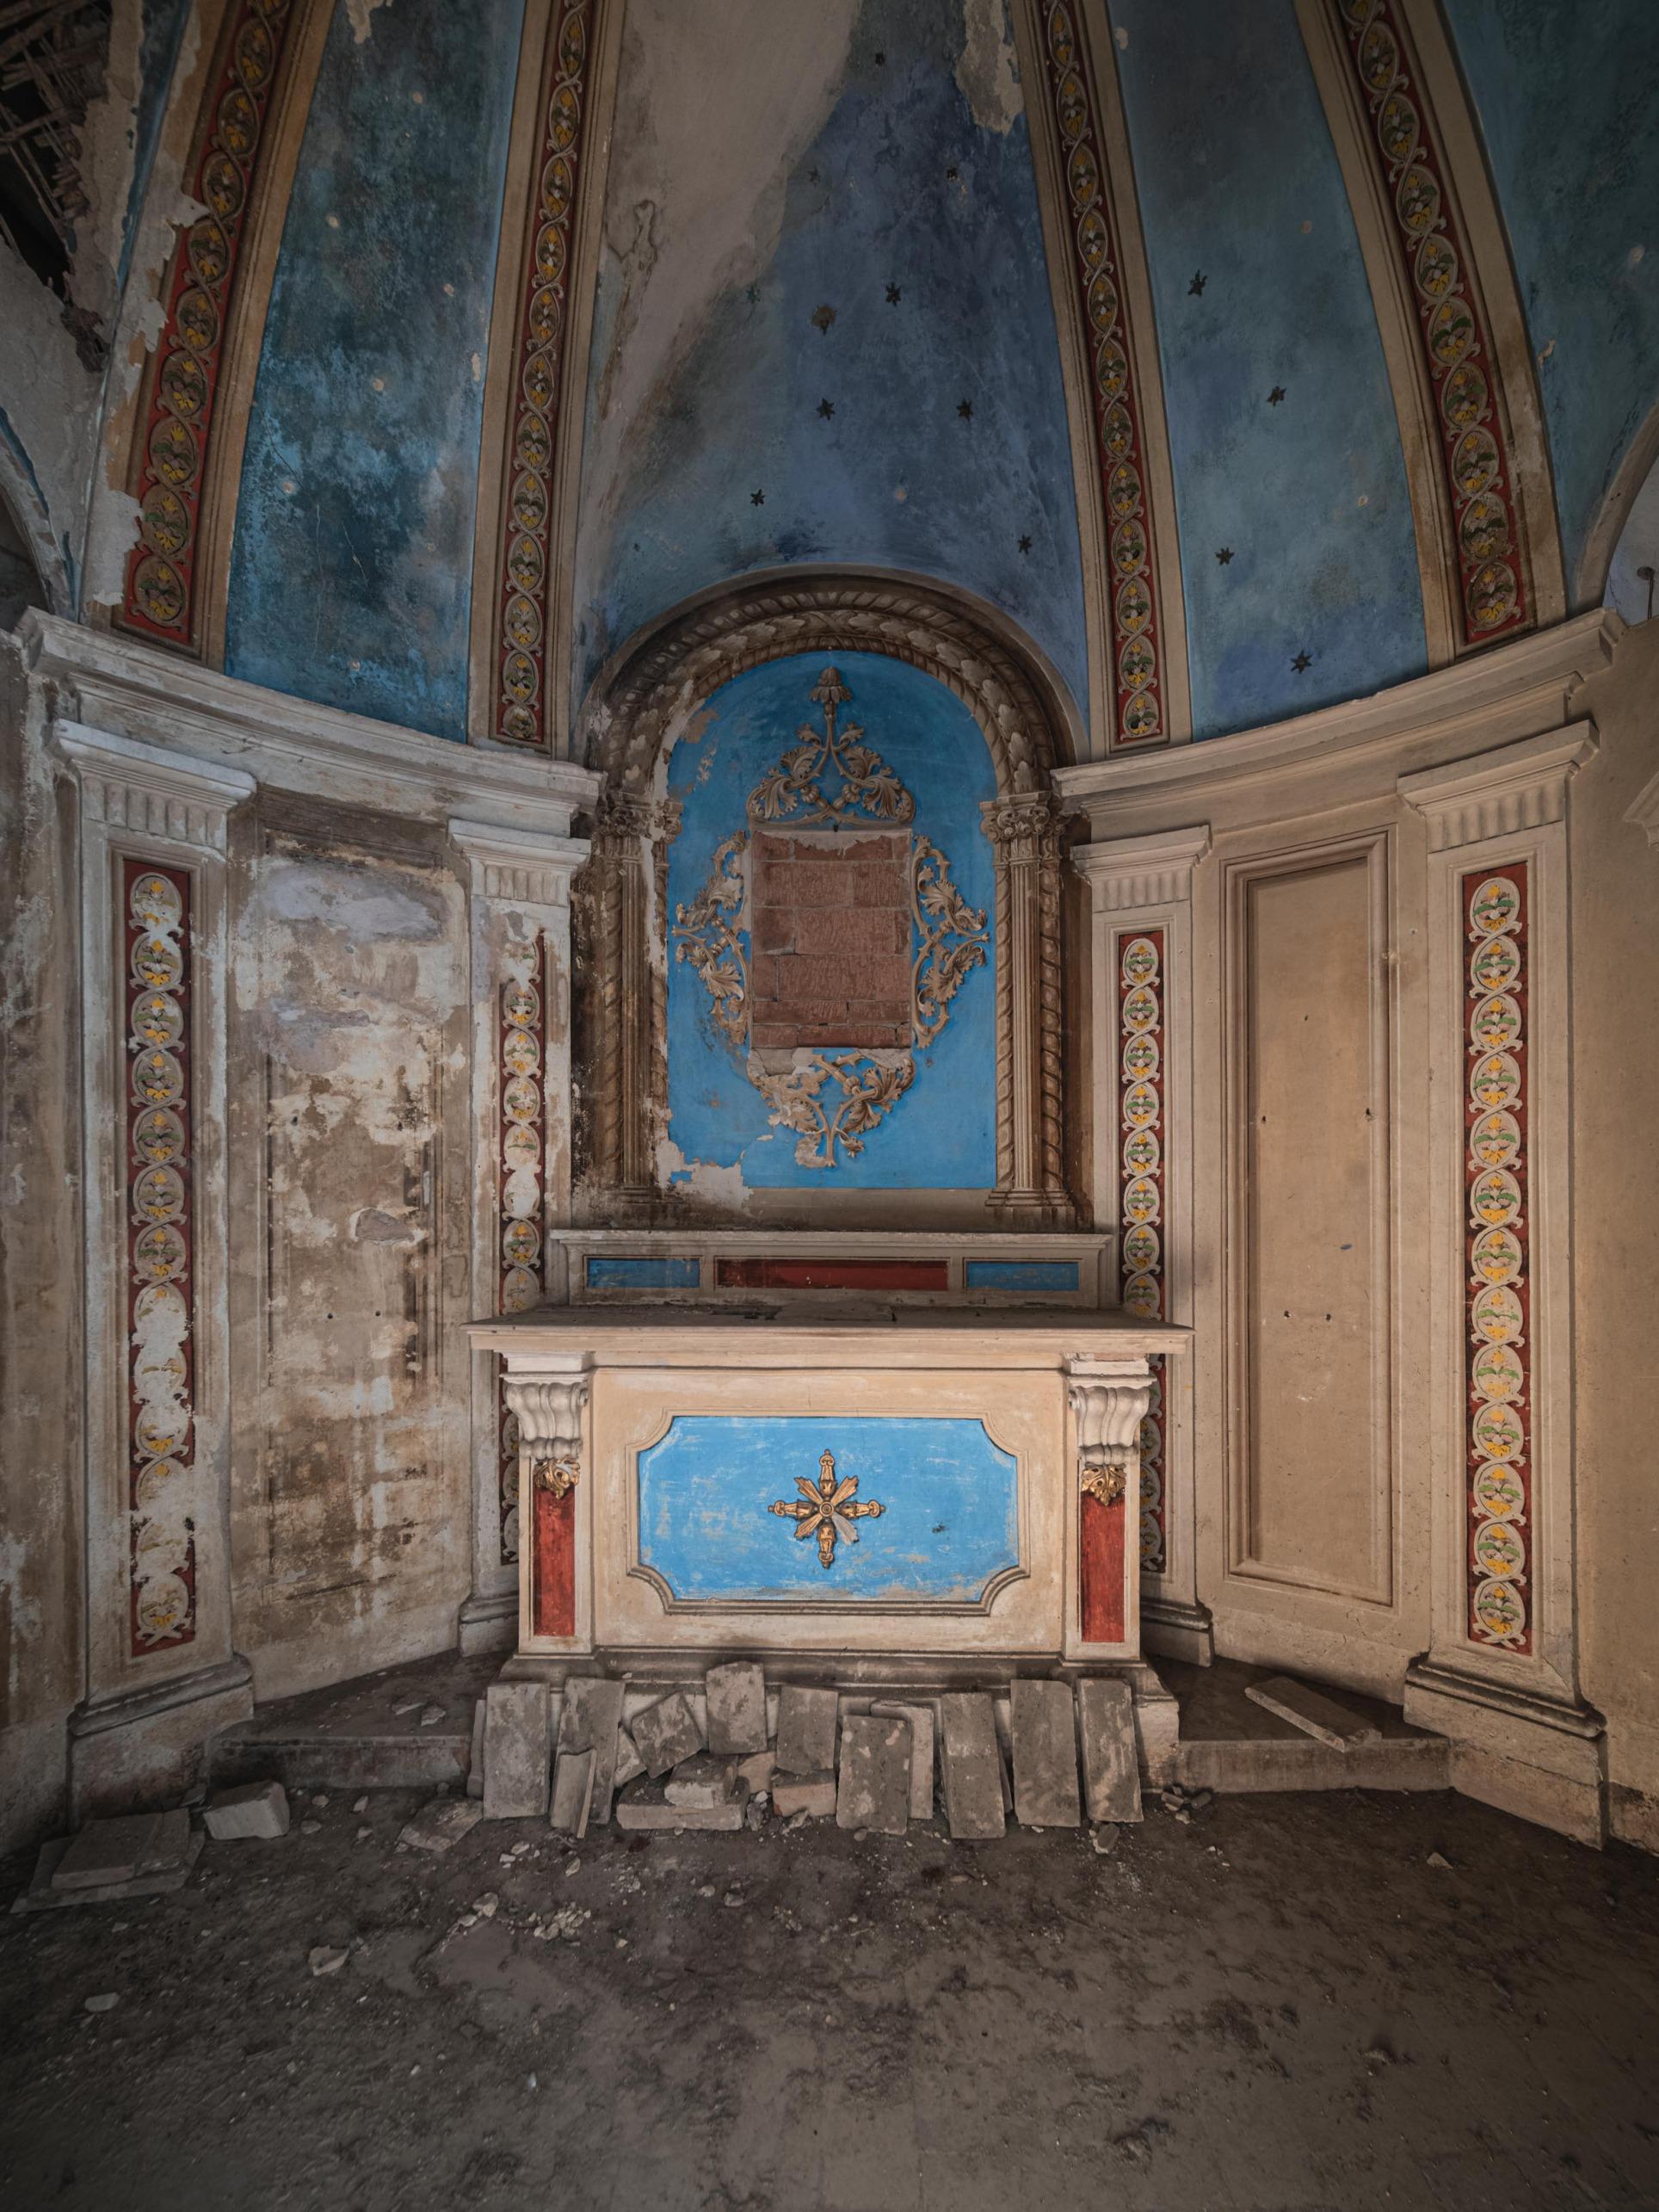 A small chapel inside the villa.